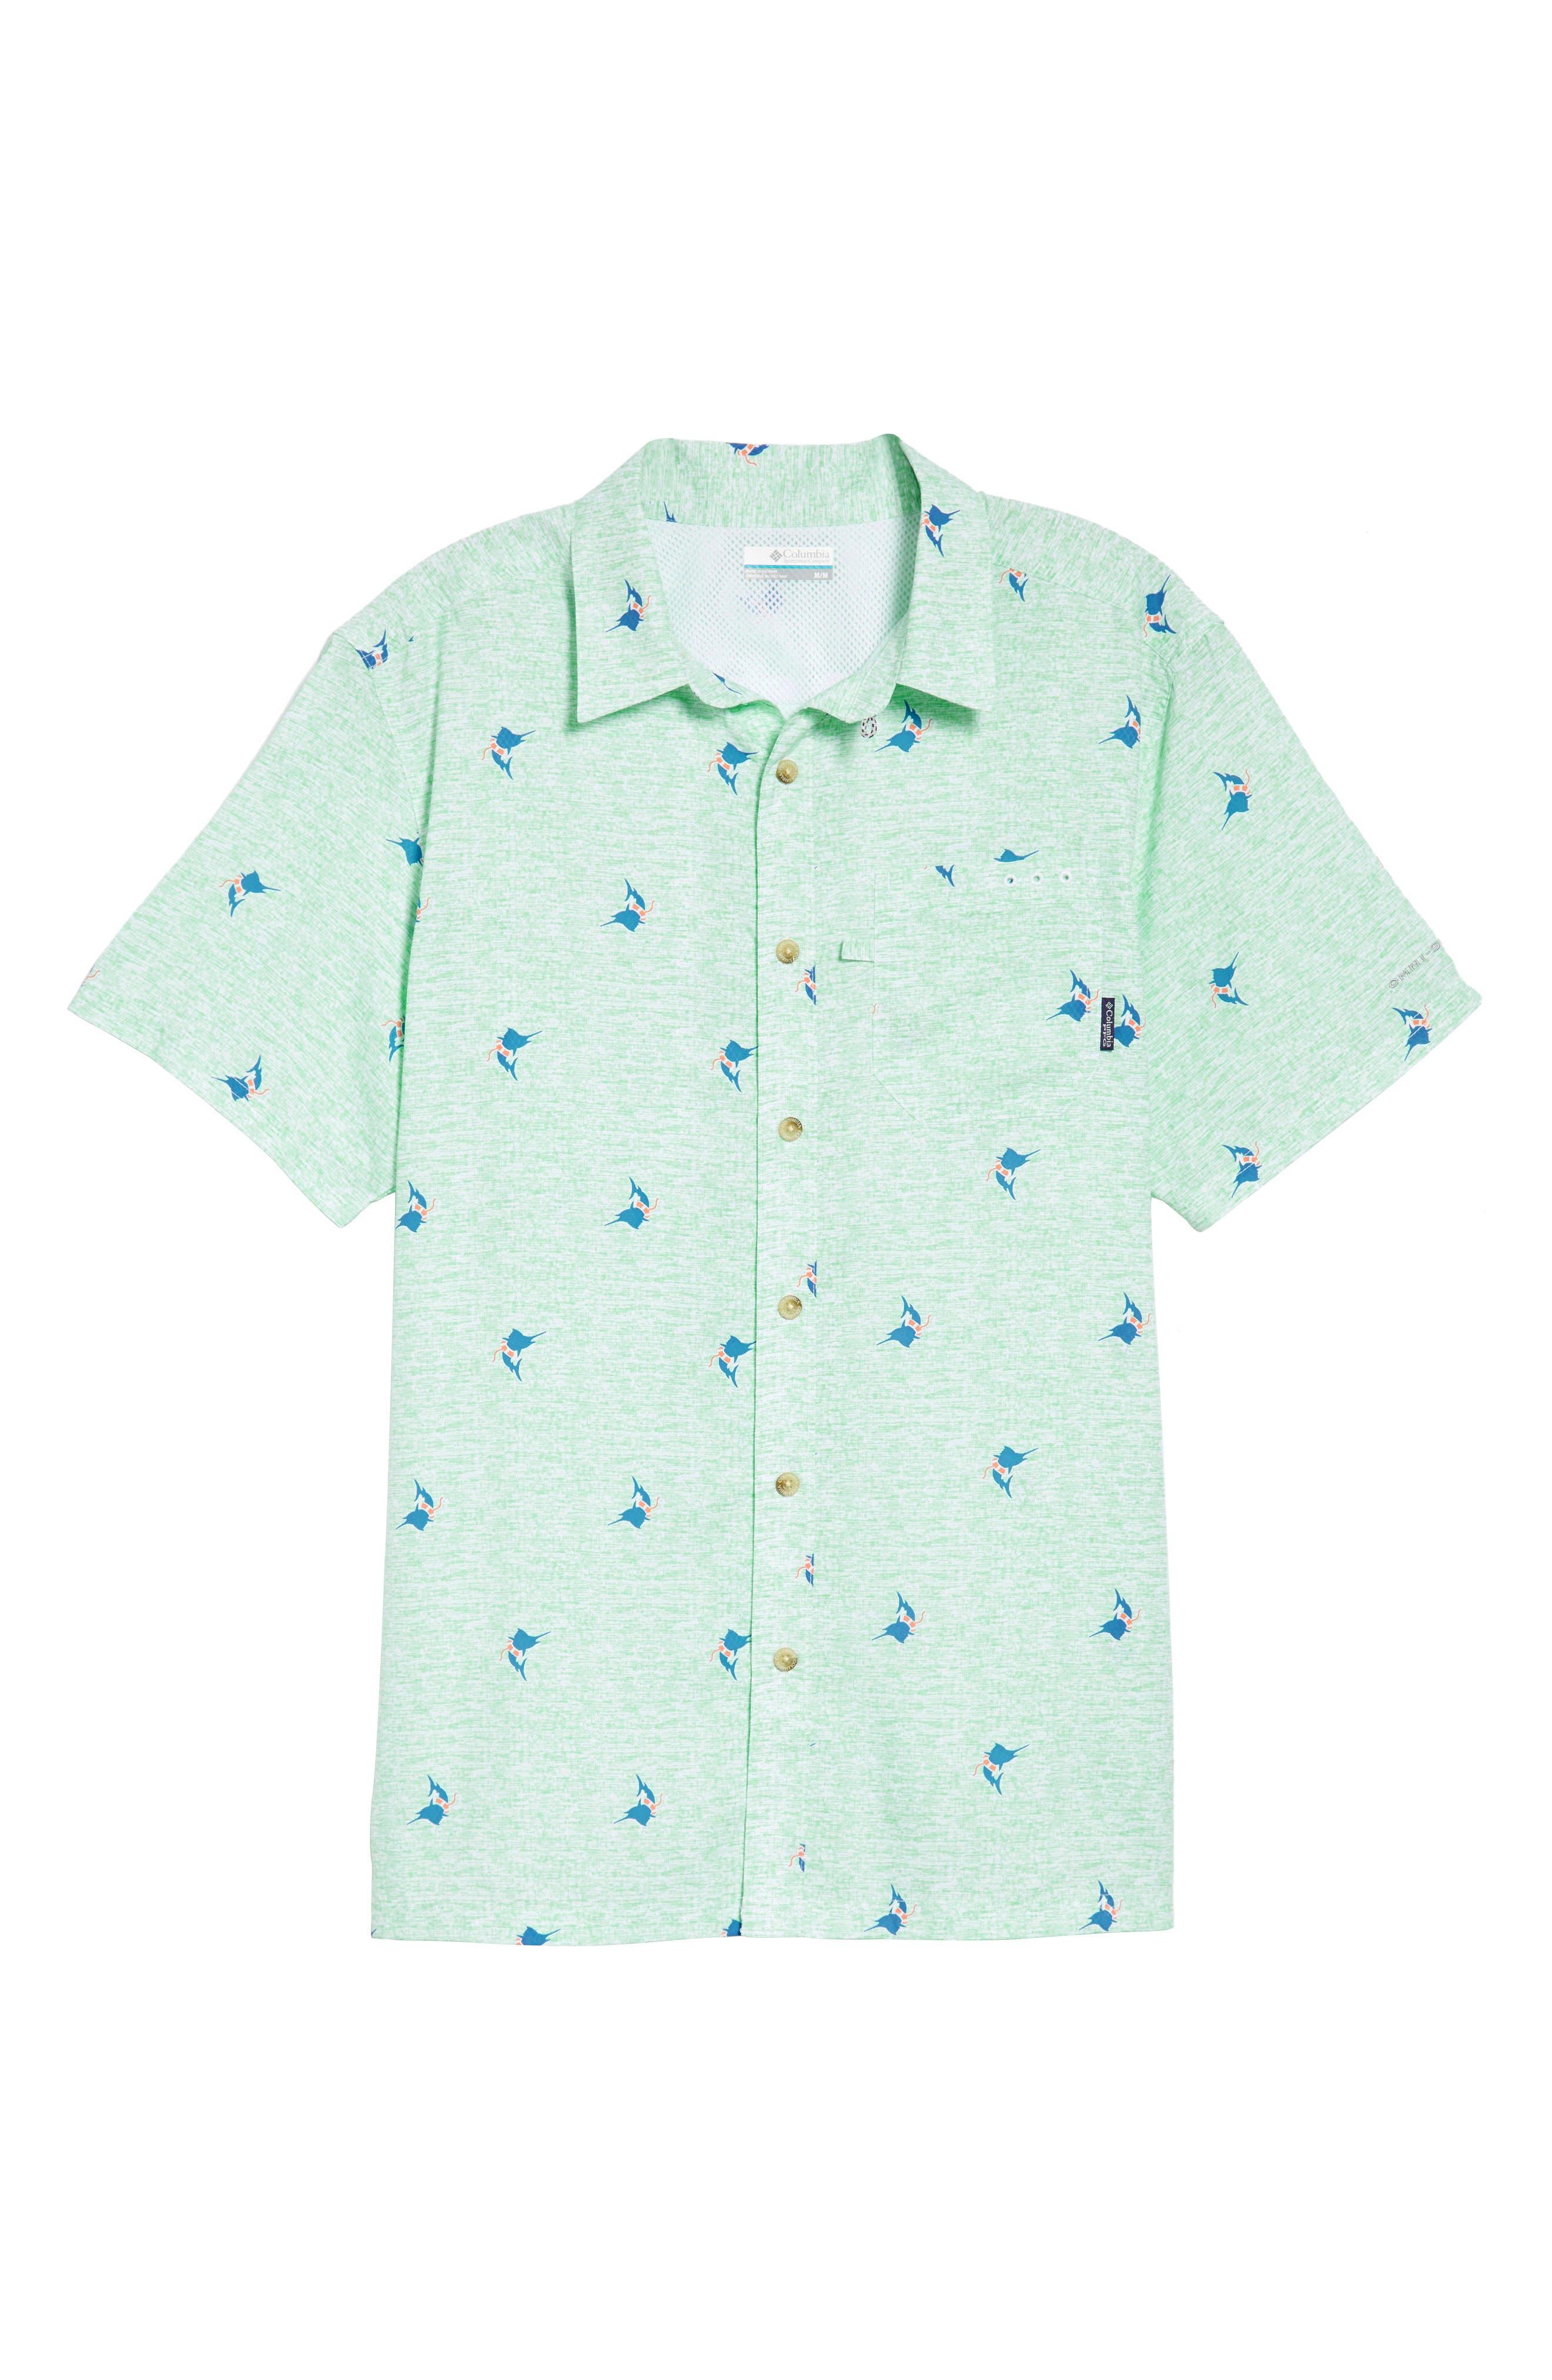 Super Slack Tide Patterned Woven Shirt,                             Alternate thumbnail 6, color,                             Kelp Marlin Print